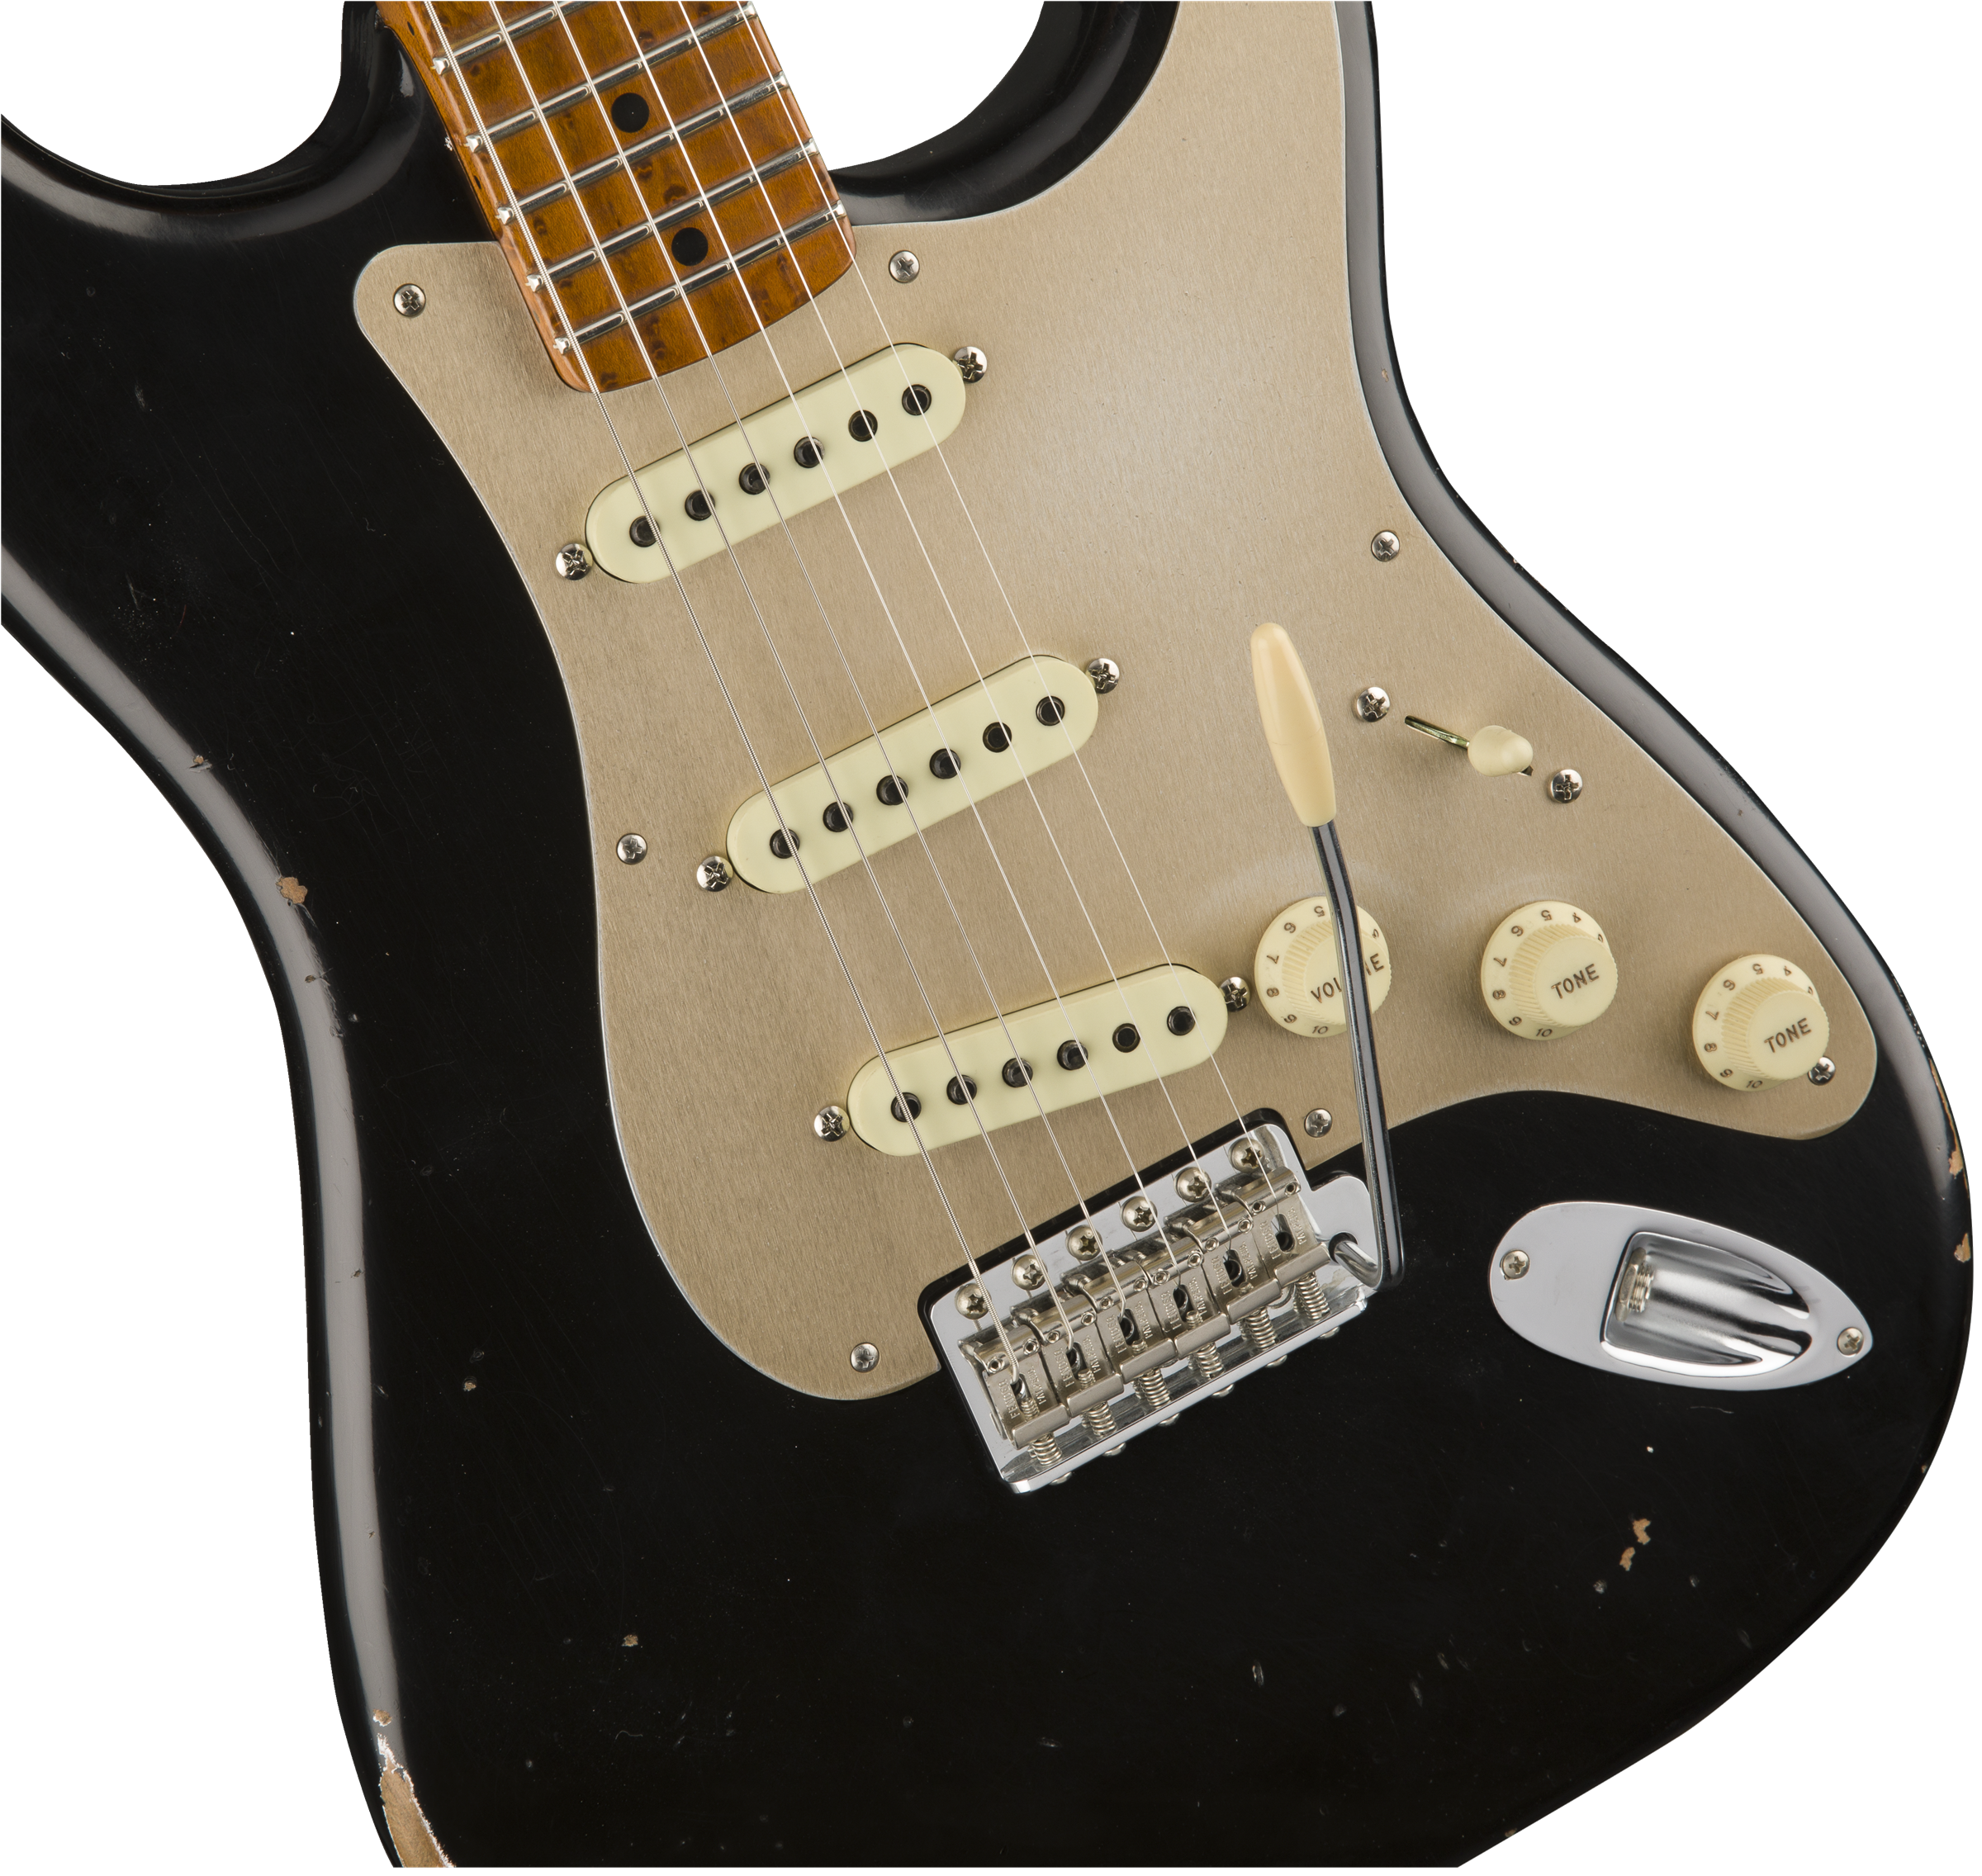 Fender Custom Shop 2017 Ltd '56 Fat Roasted Strat – Journeyman Relic